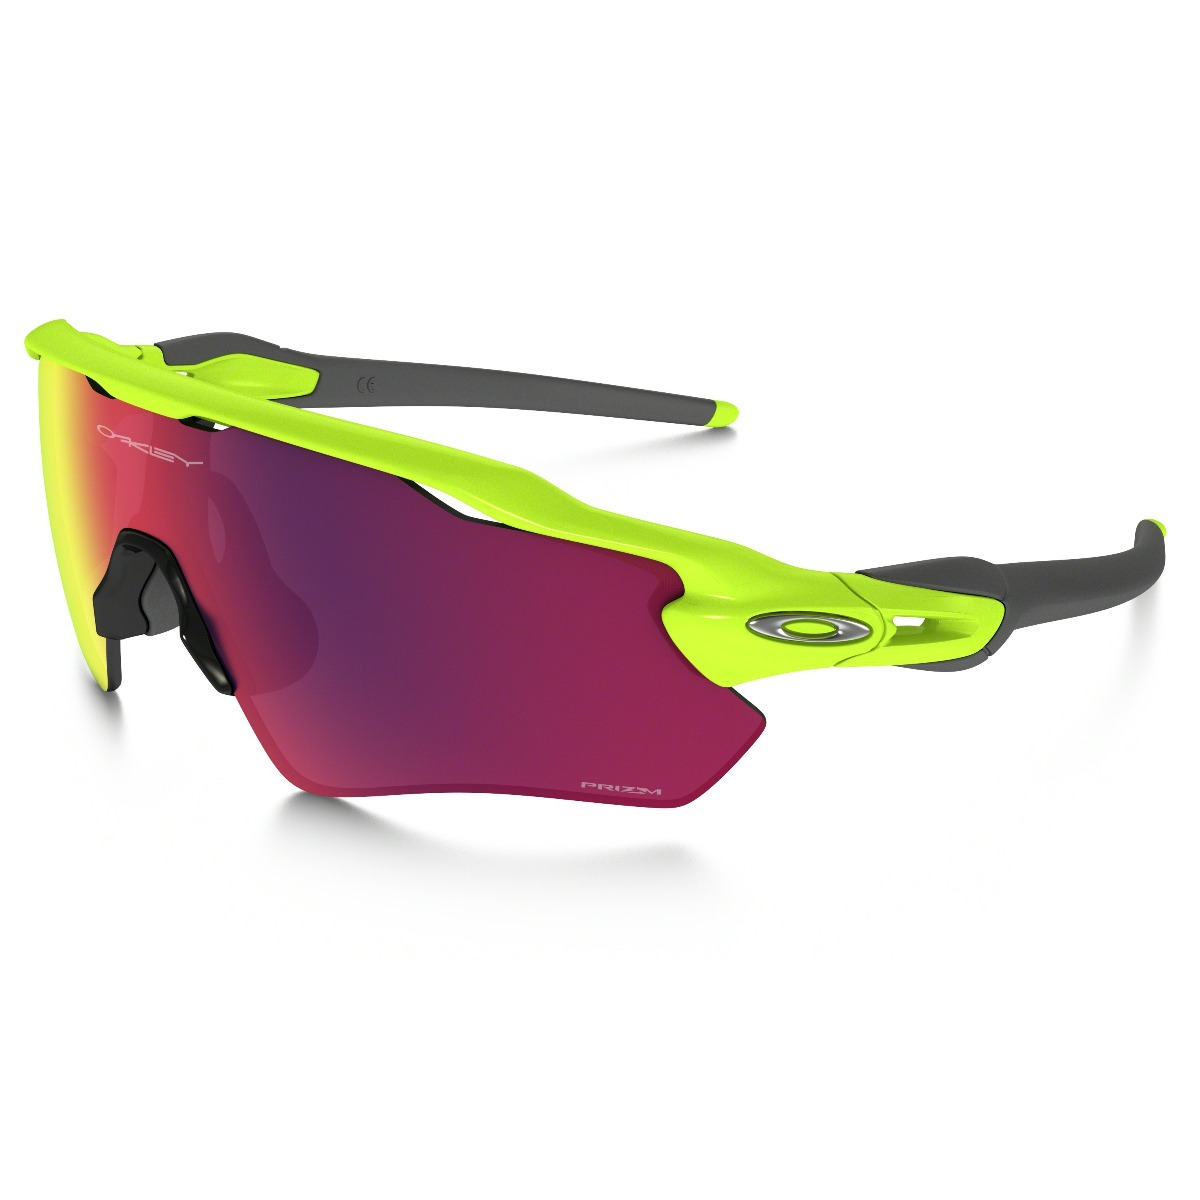 8ec6b5bf496d0 lentes oakley radar ev path retina burn prizm road ciclismo. Cargando zoom.